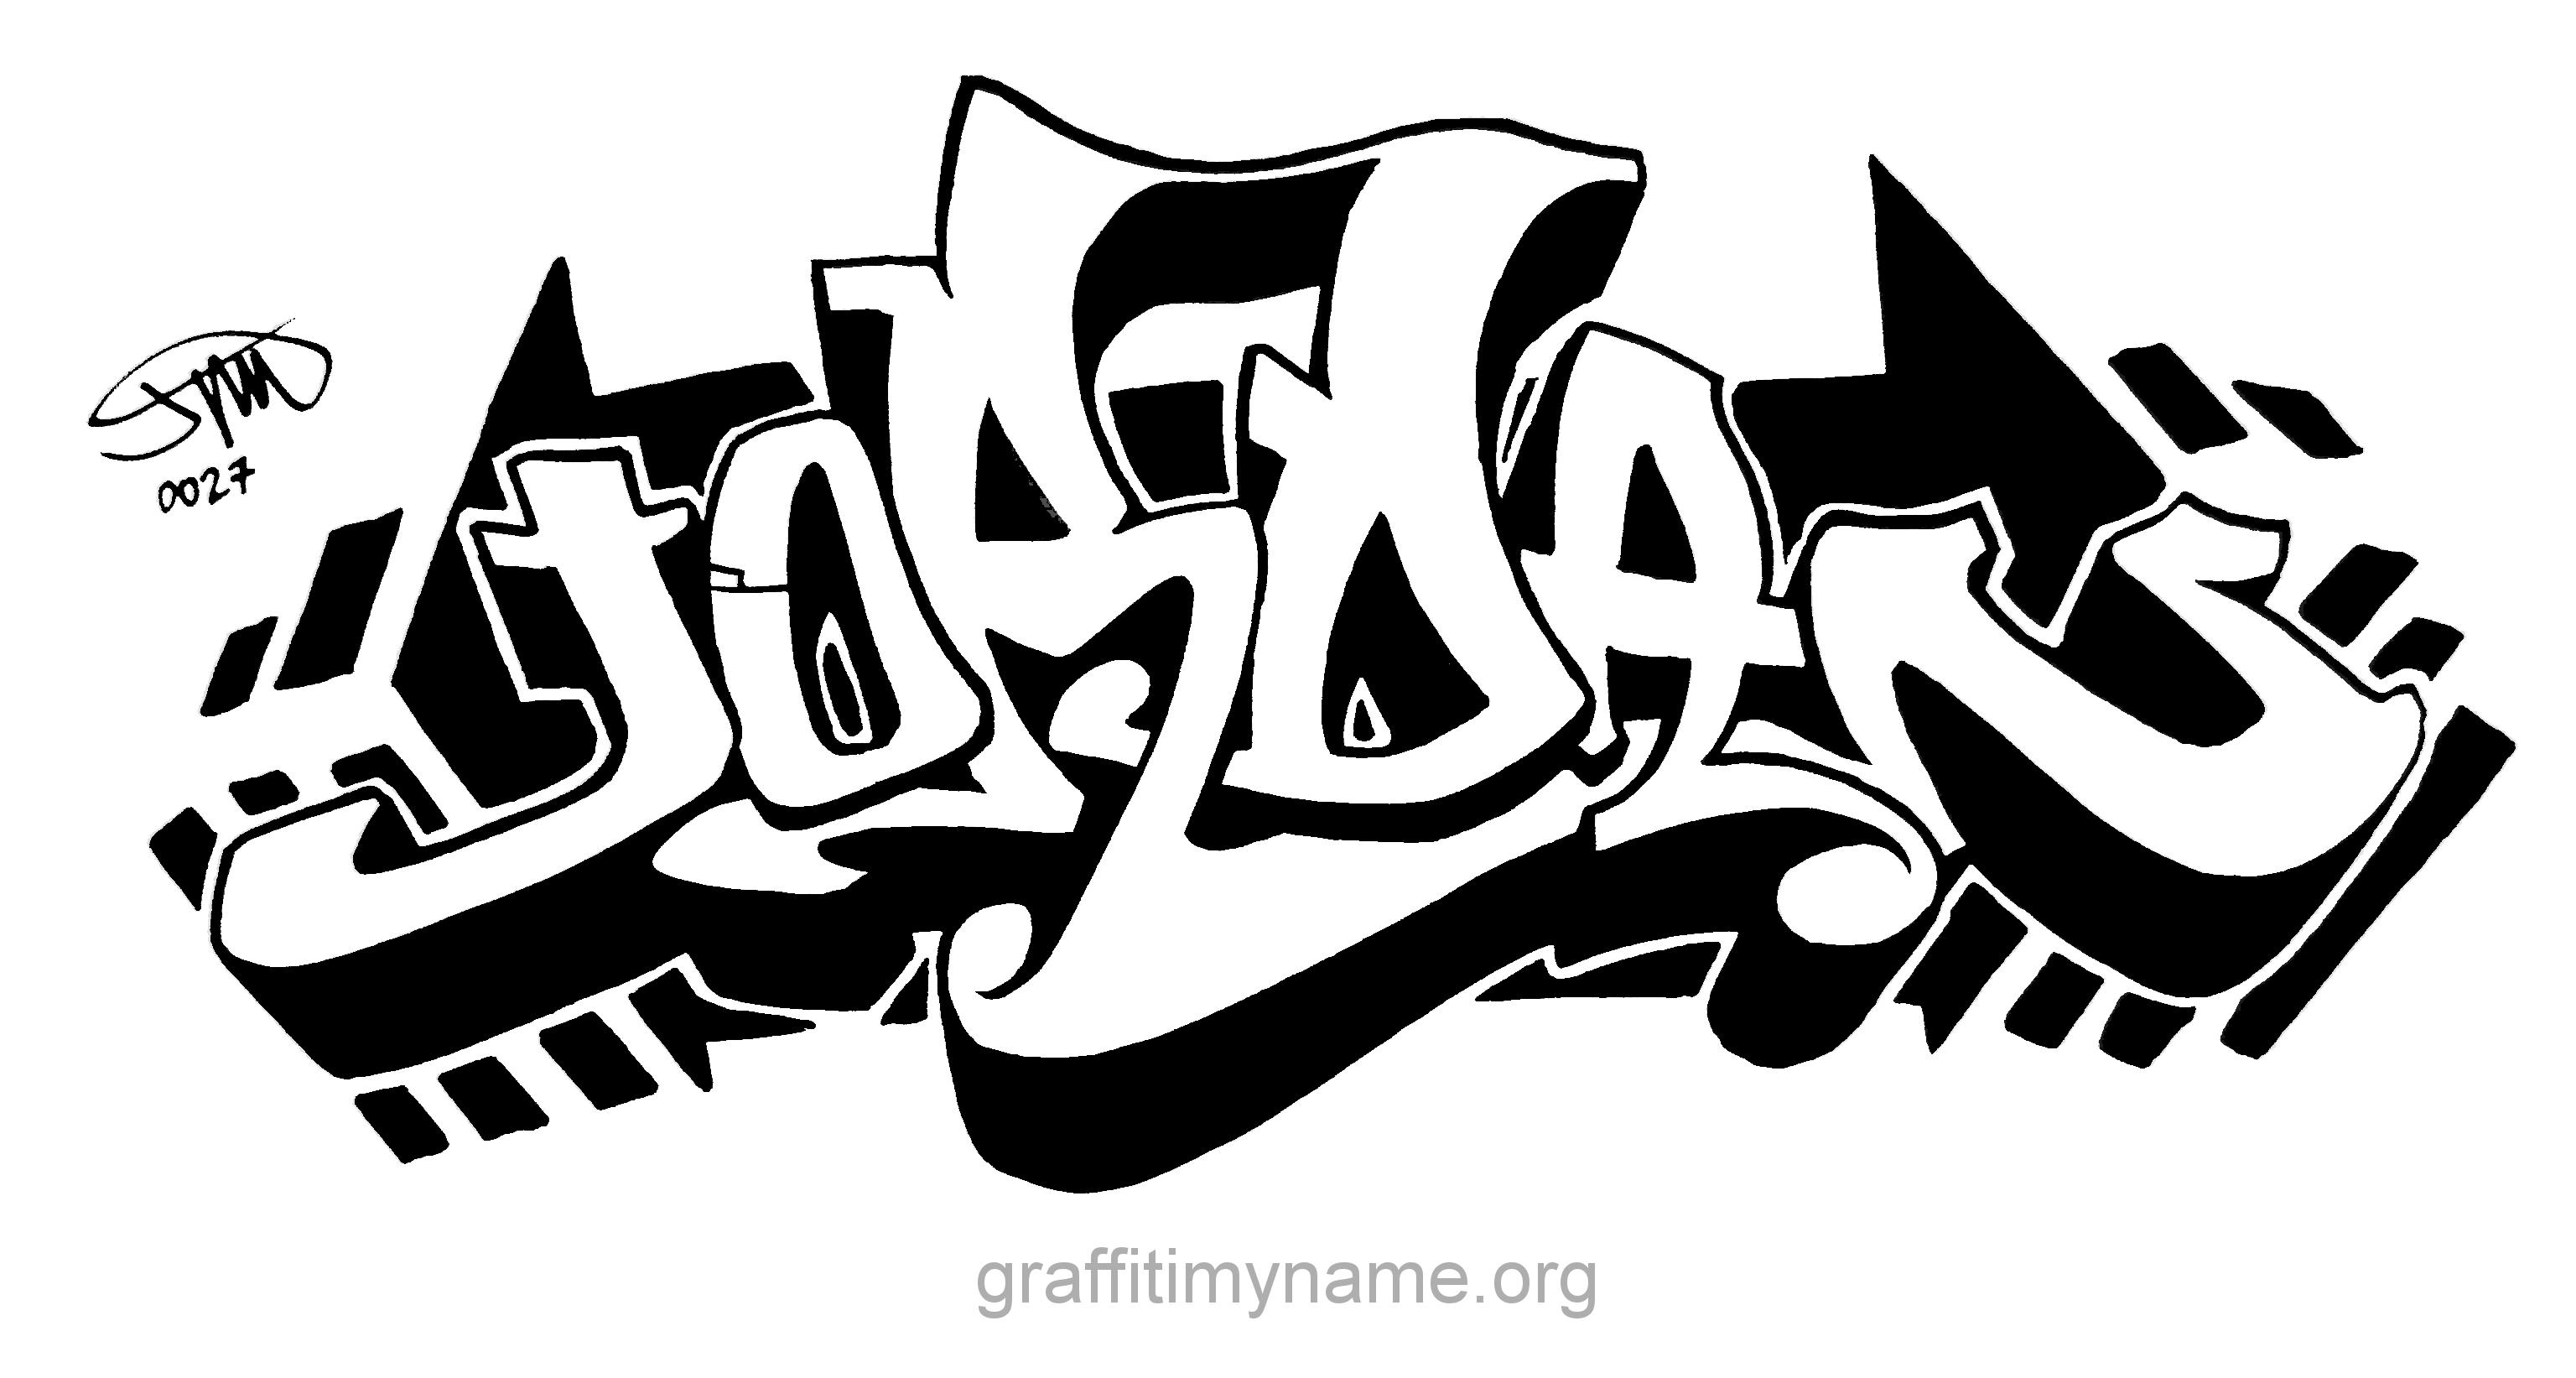 Quot Jordan Quot Hand Drawn Graffiti Style First Names